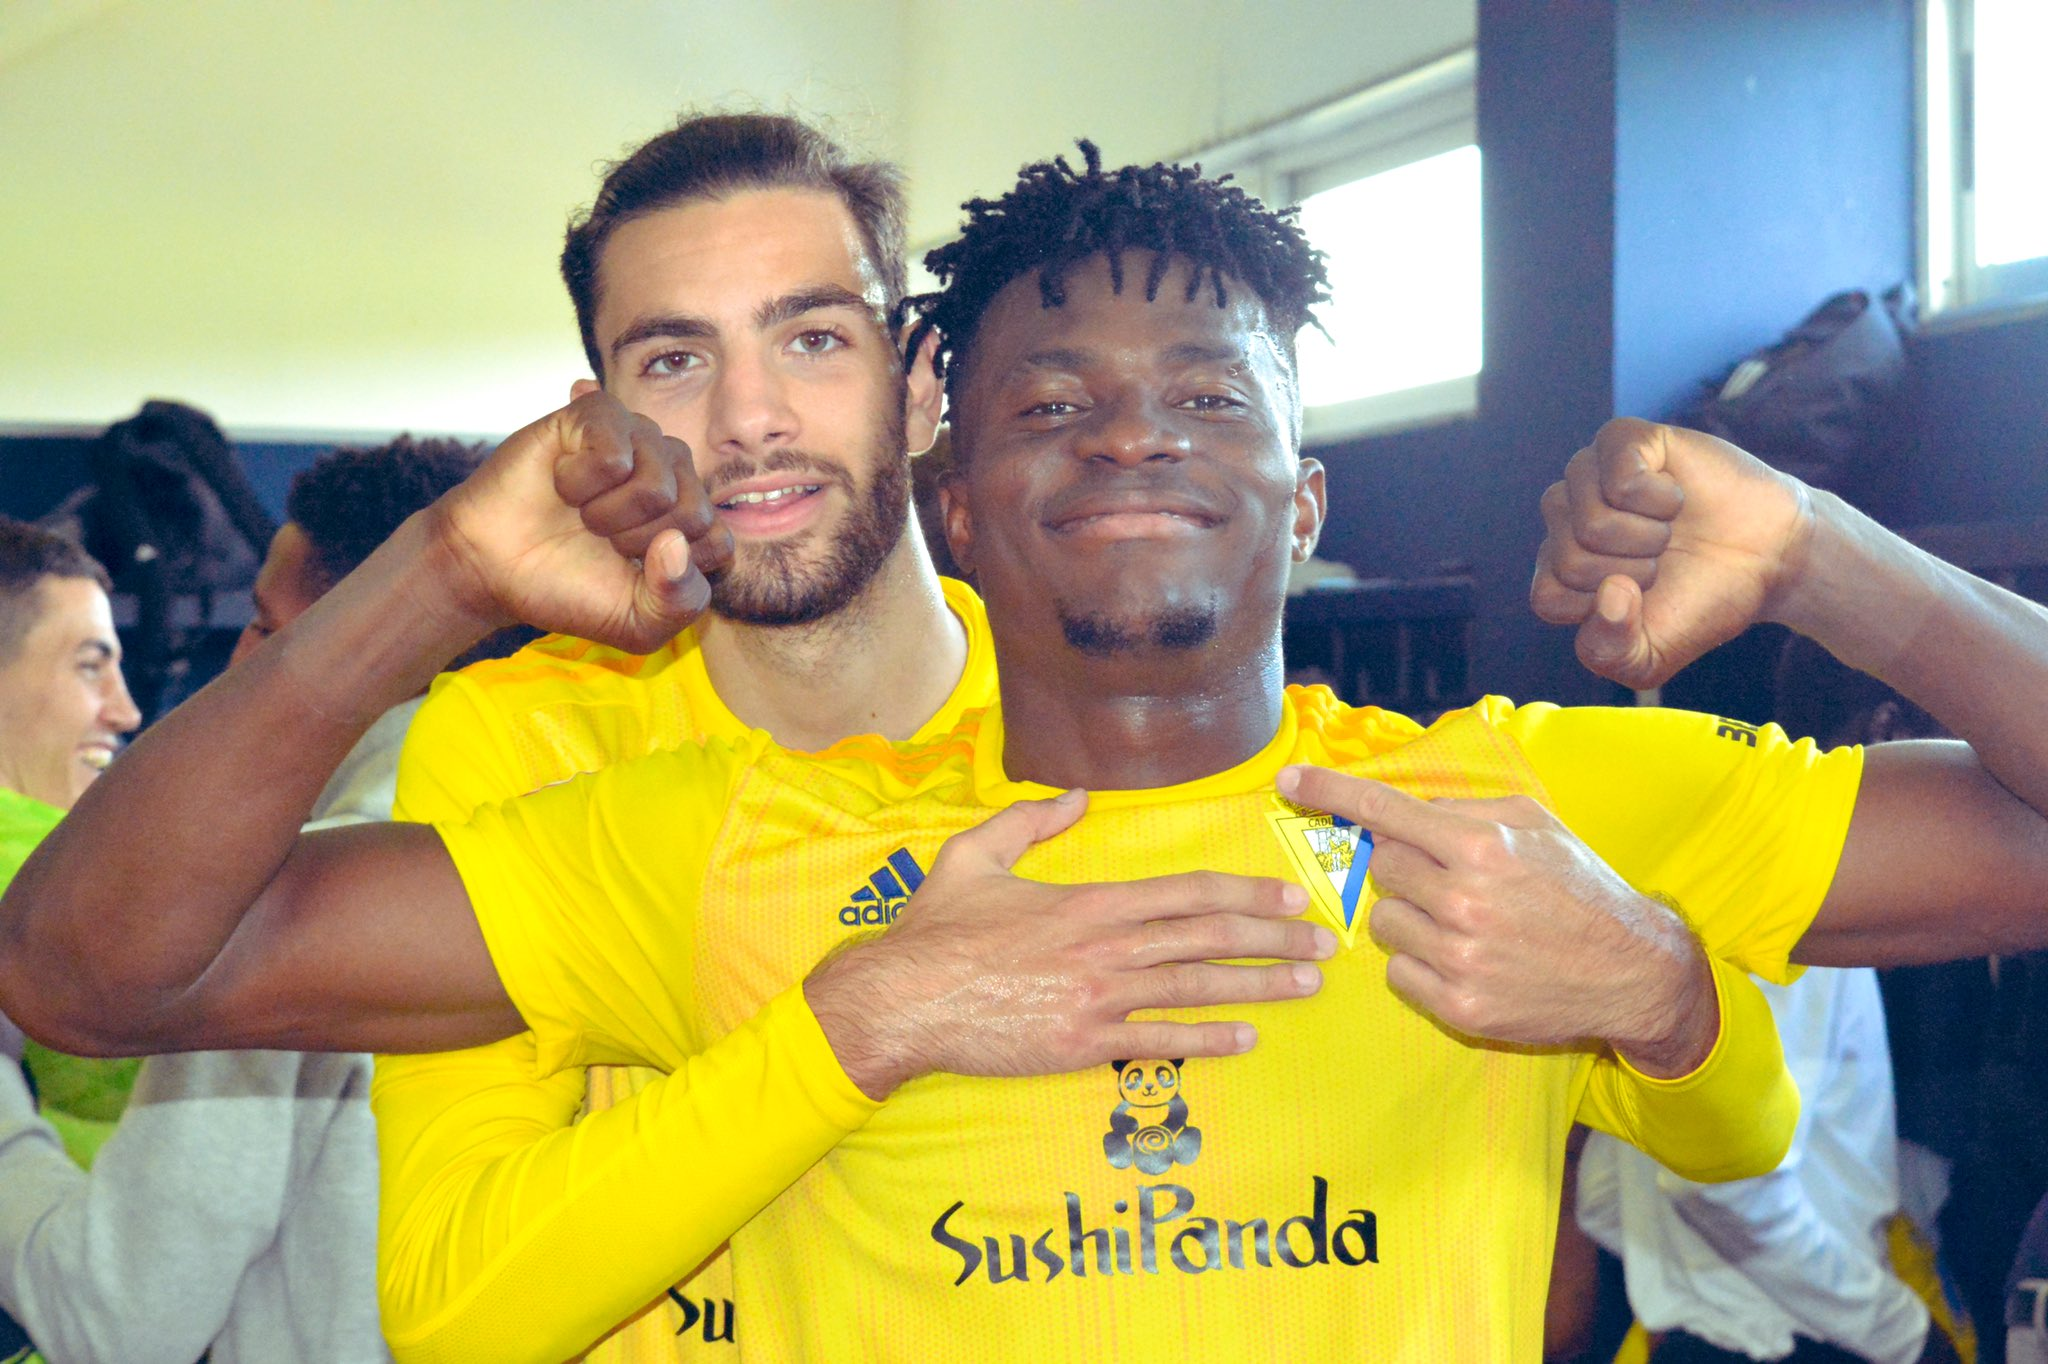 Erimuya Replaces  Omeruo As Only Nigerian Defender In Laliga Santander